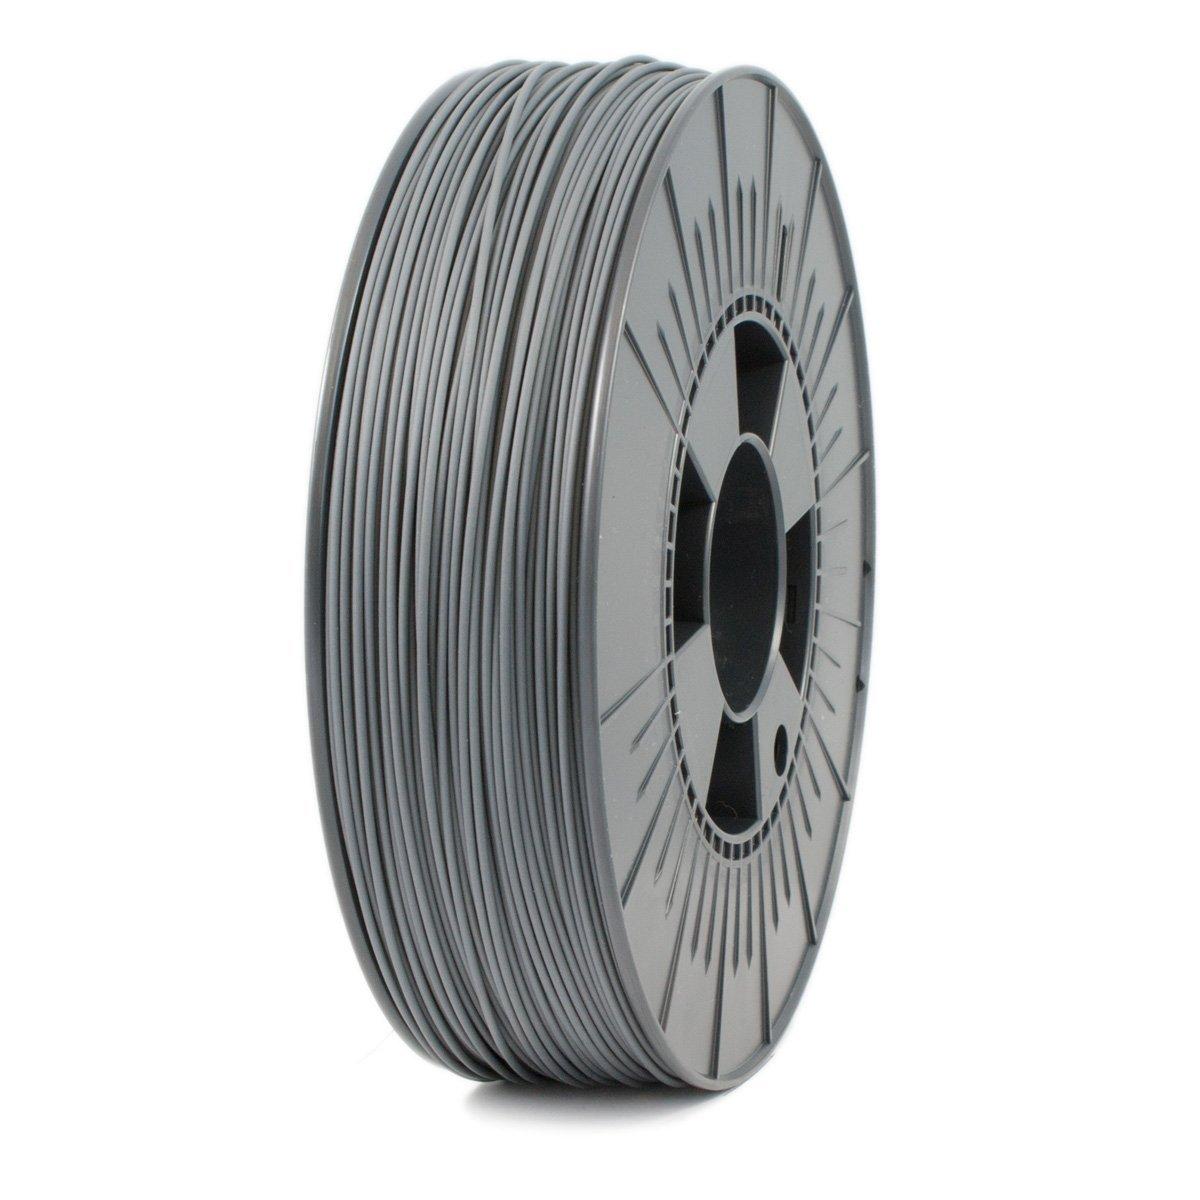 Ice Filaments  Gentle Grey HIPS 1.75 mm